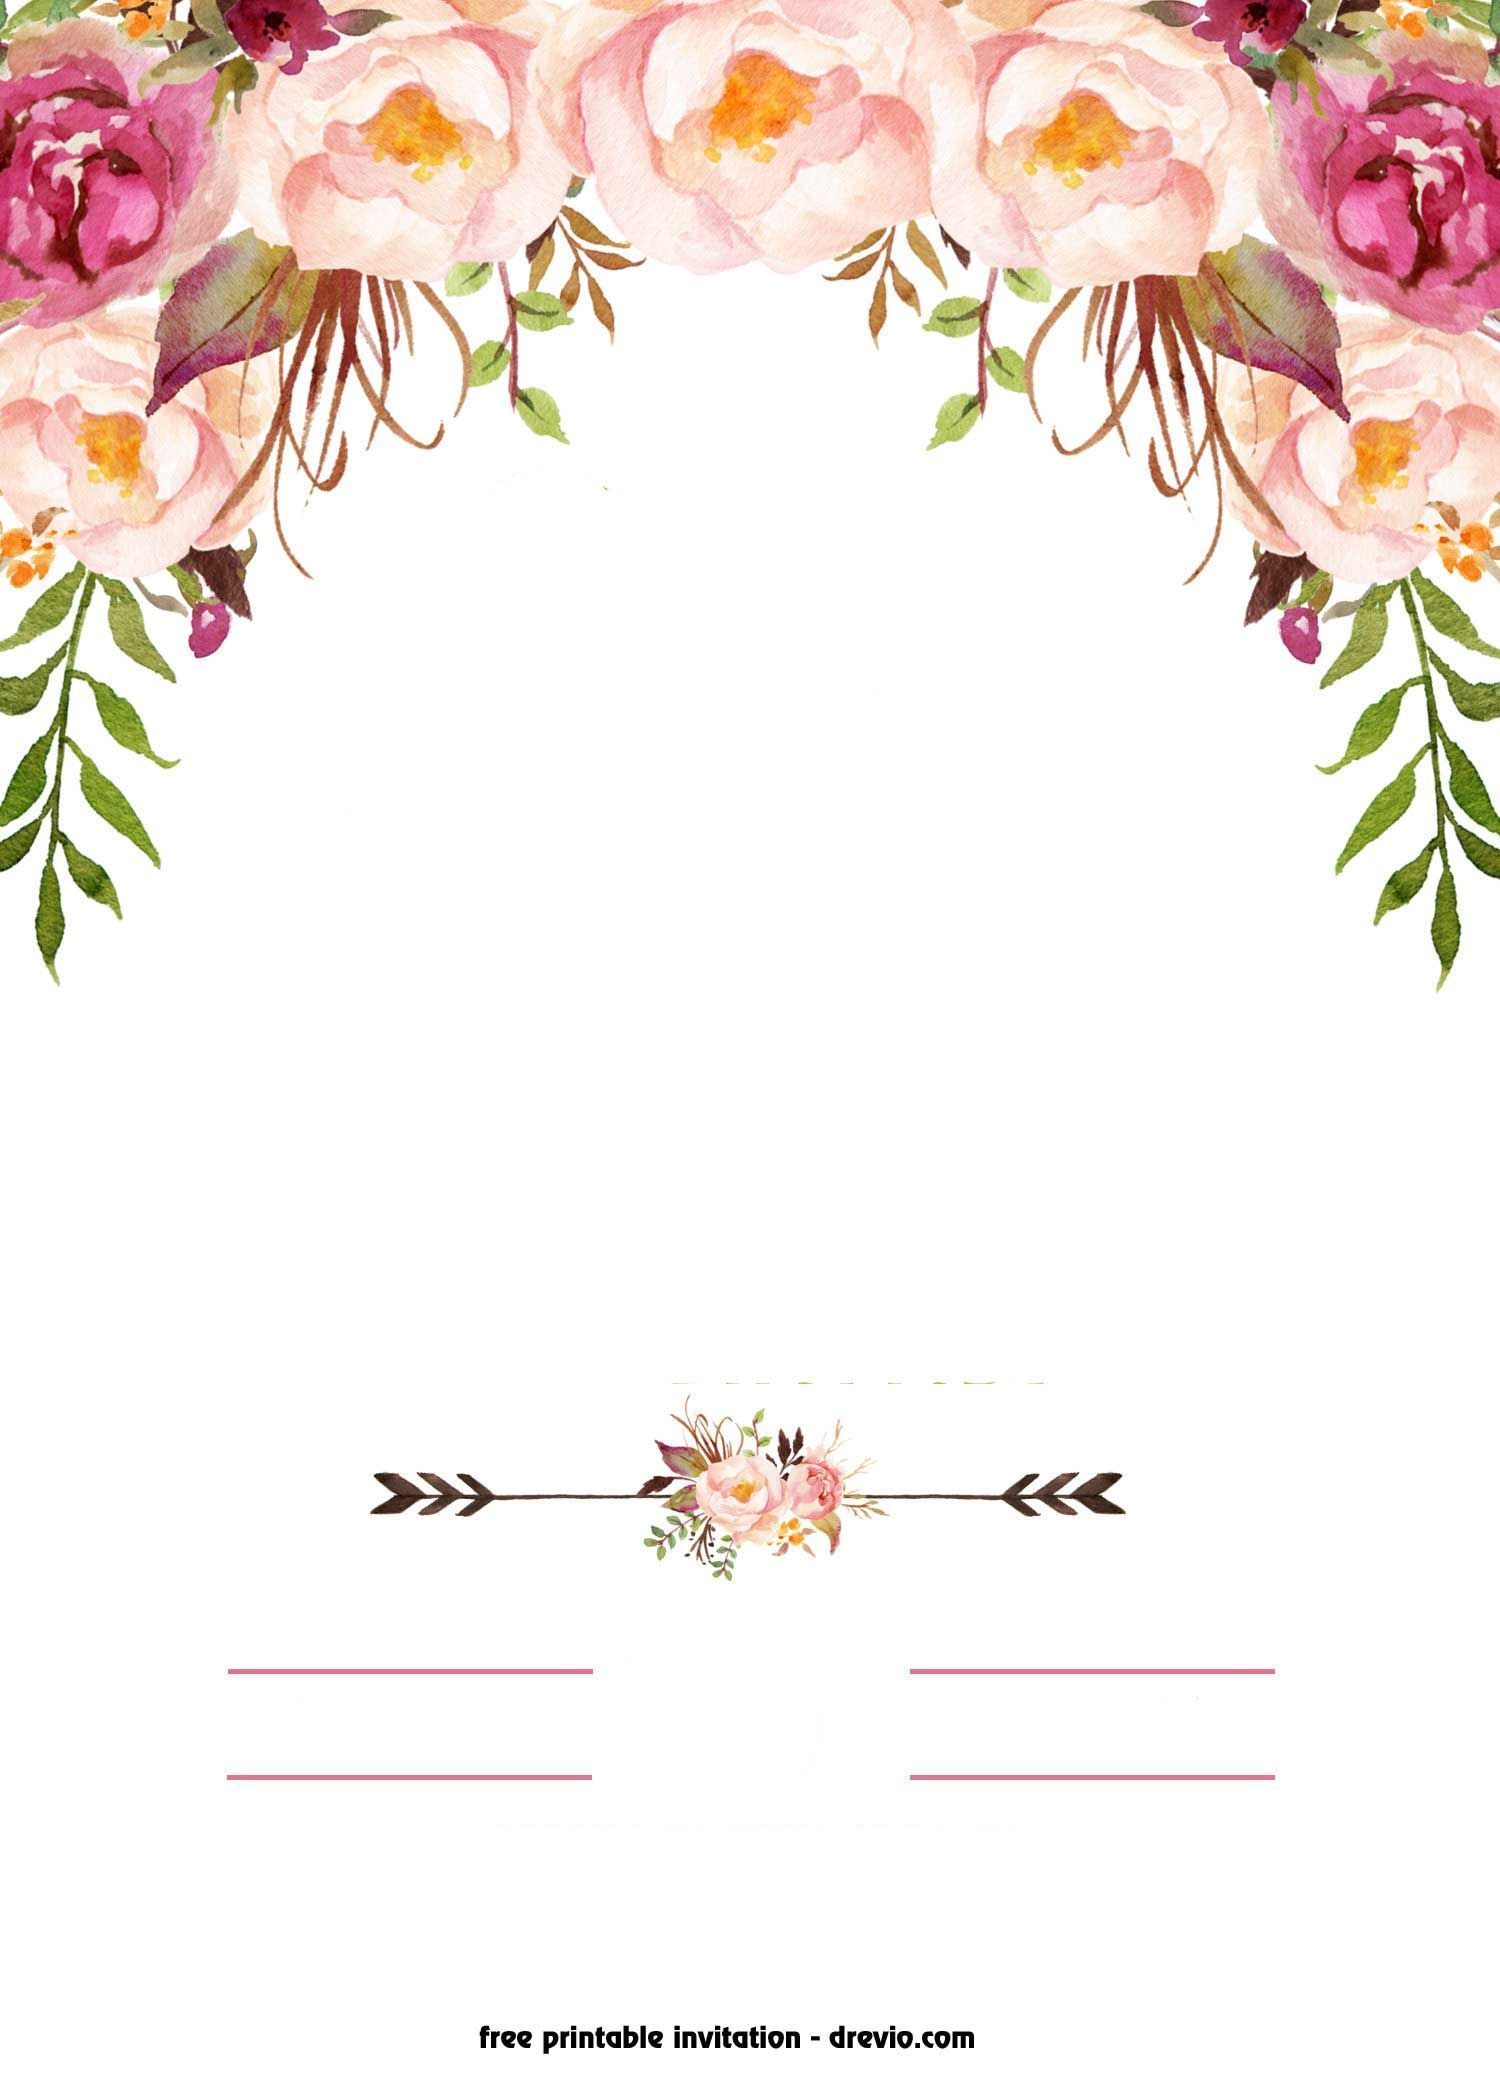 Free Printable Boho Chic Flower Baby Shower Invitation